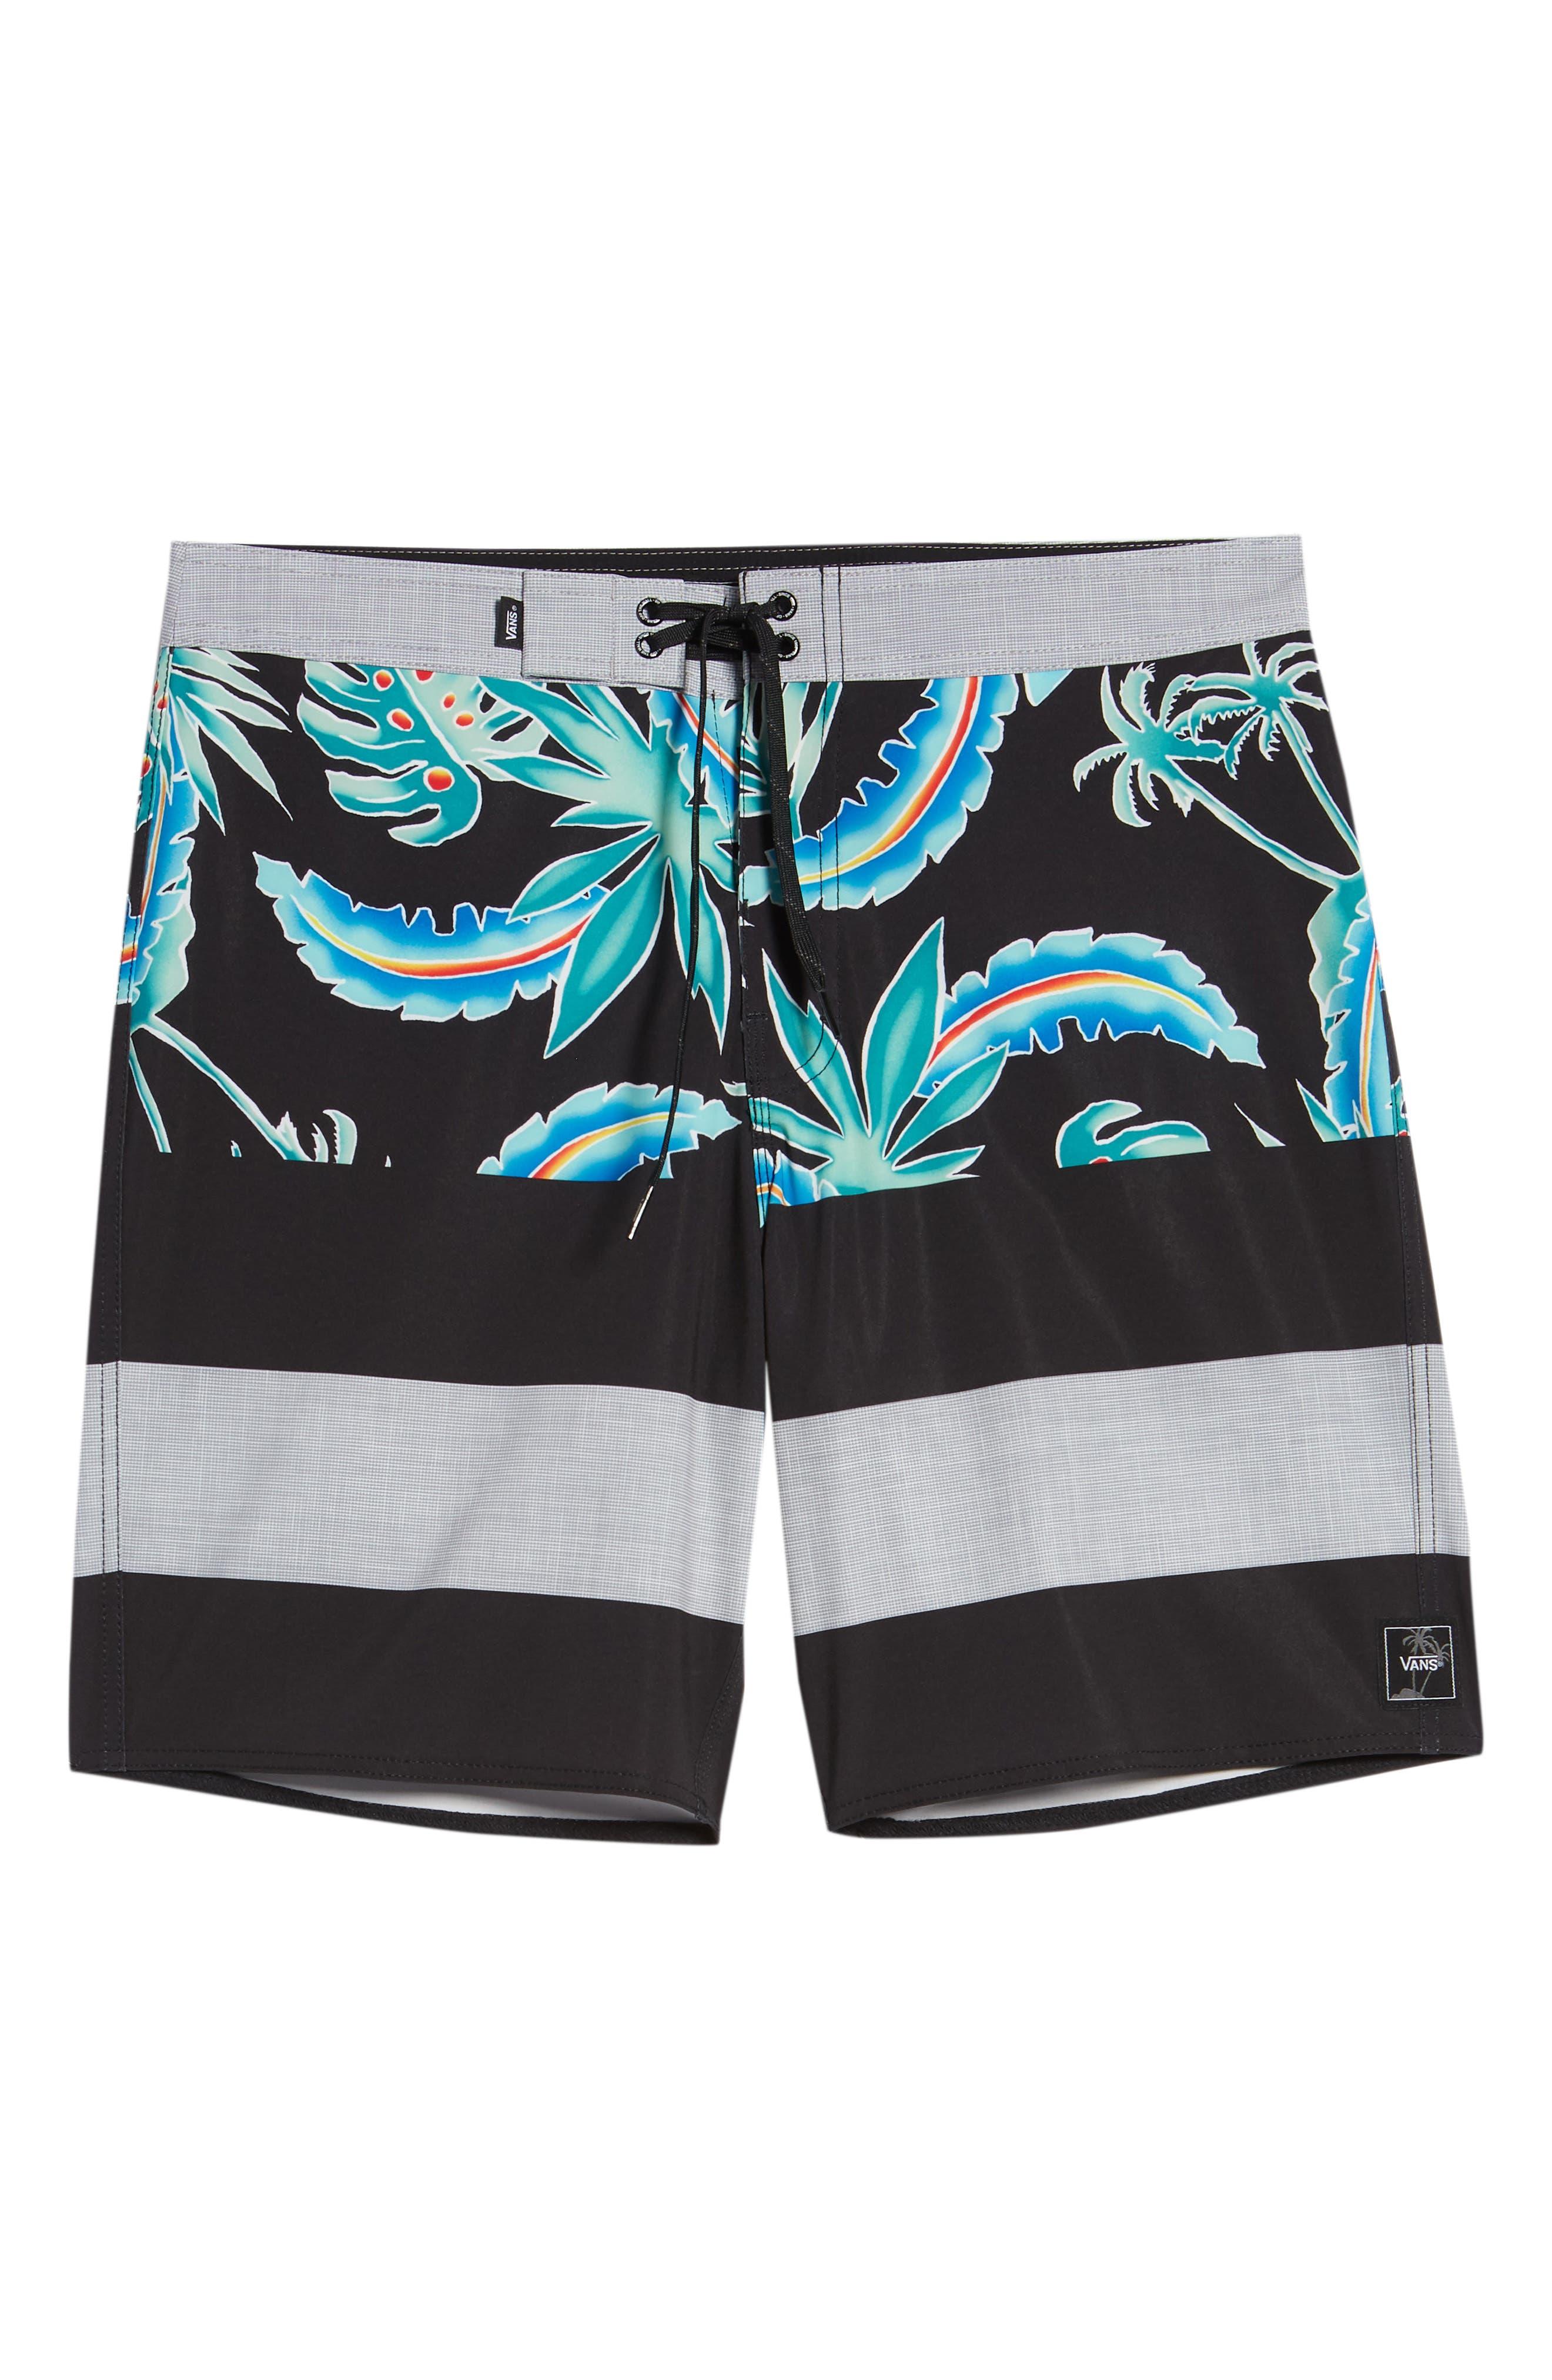 Era Board Shorts,                             Alternate thumbnail 6, color,                             Black Pit Stop Floral